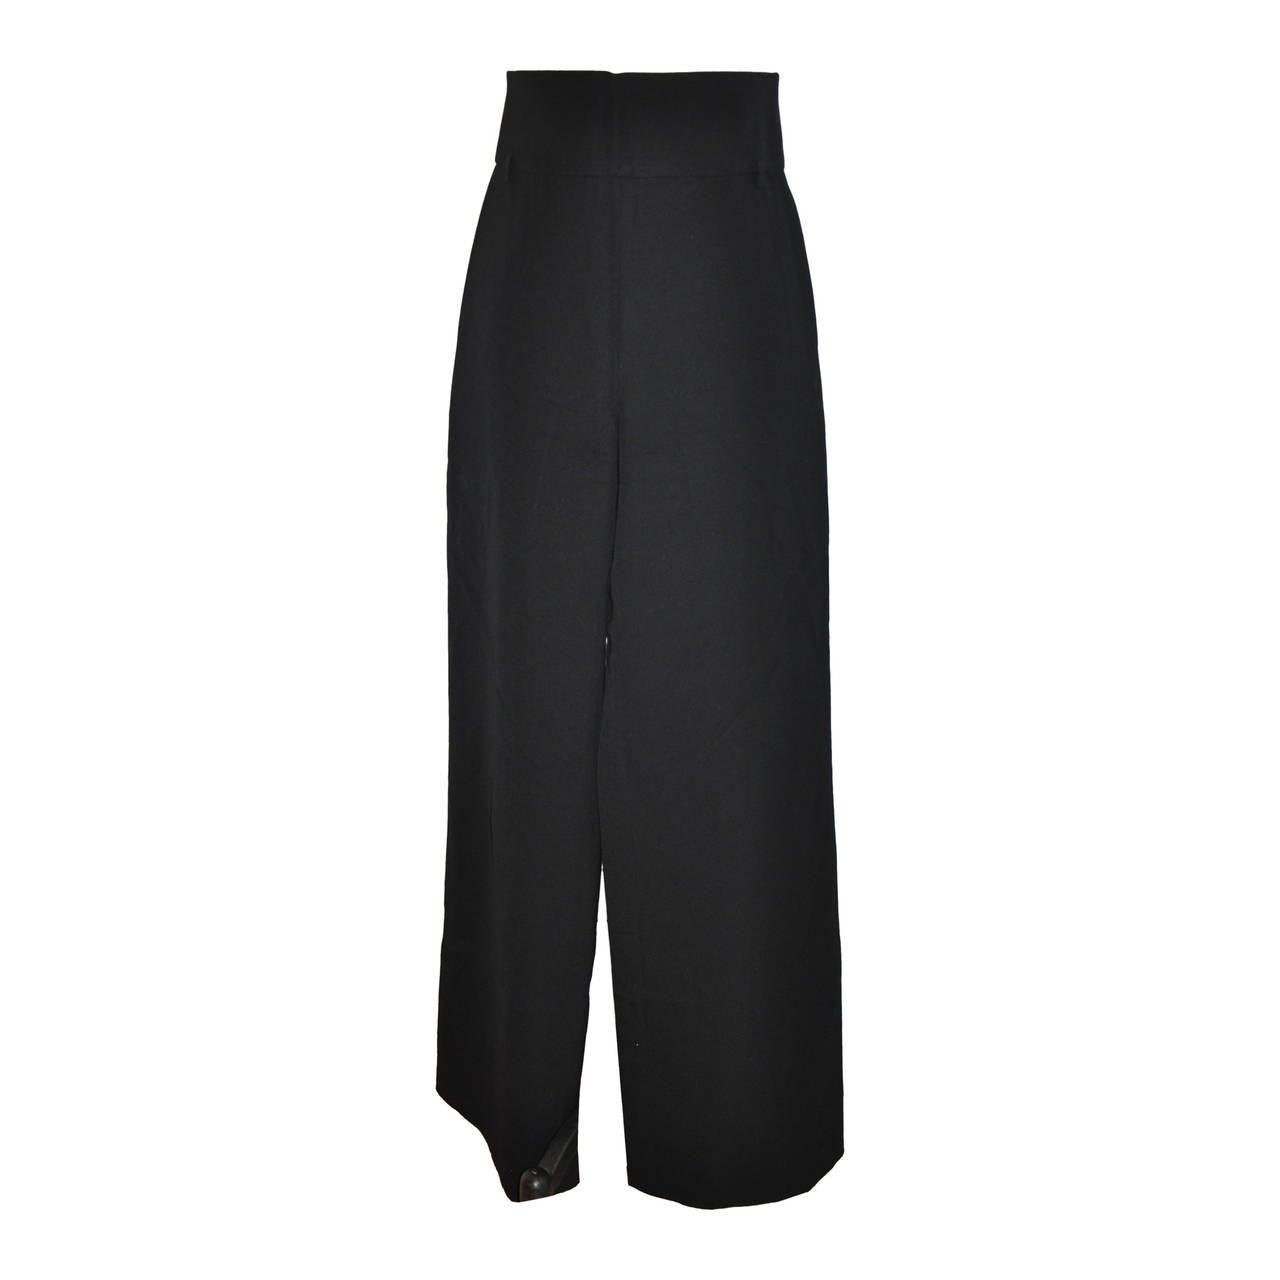 Yves Saint Laurent Signature Black High-Waisted Gabardine Trousers 1